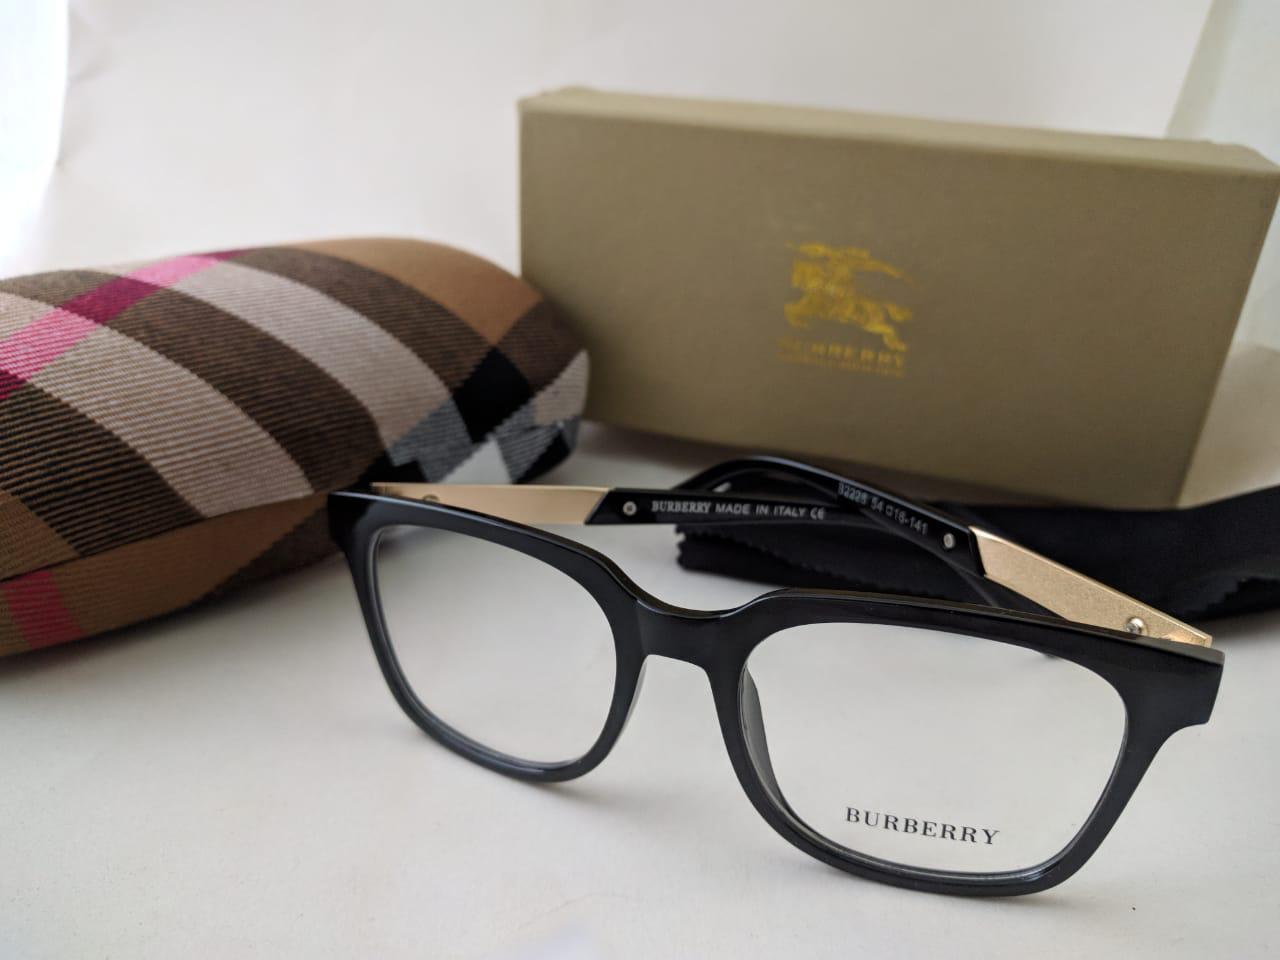 7f86215db2f Buy Burberry Sunglasses 2 at Best Prices Online in Pakistan - daraz.pk